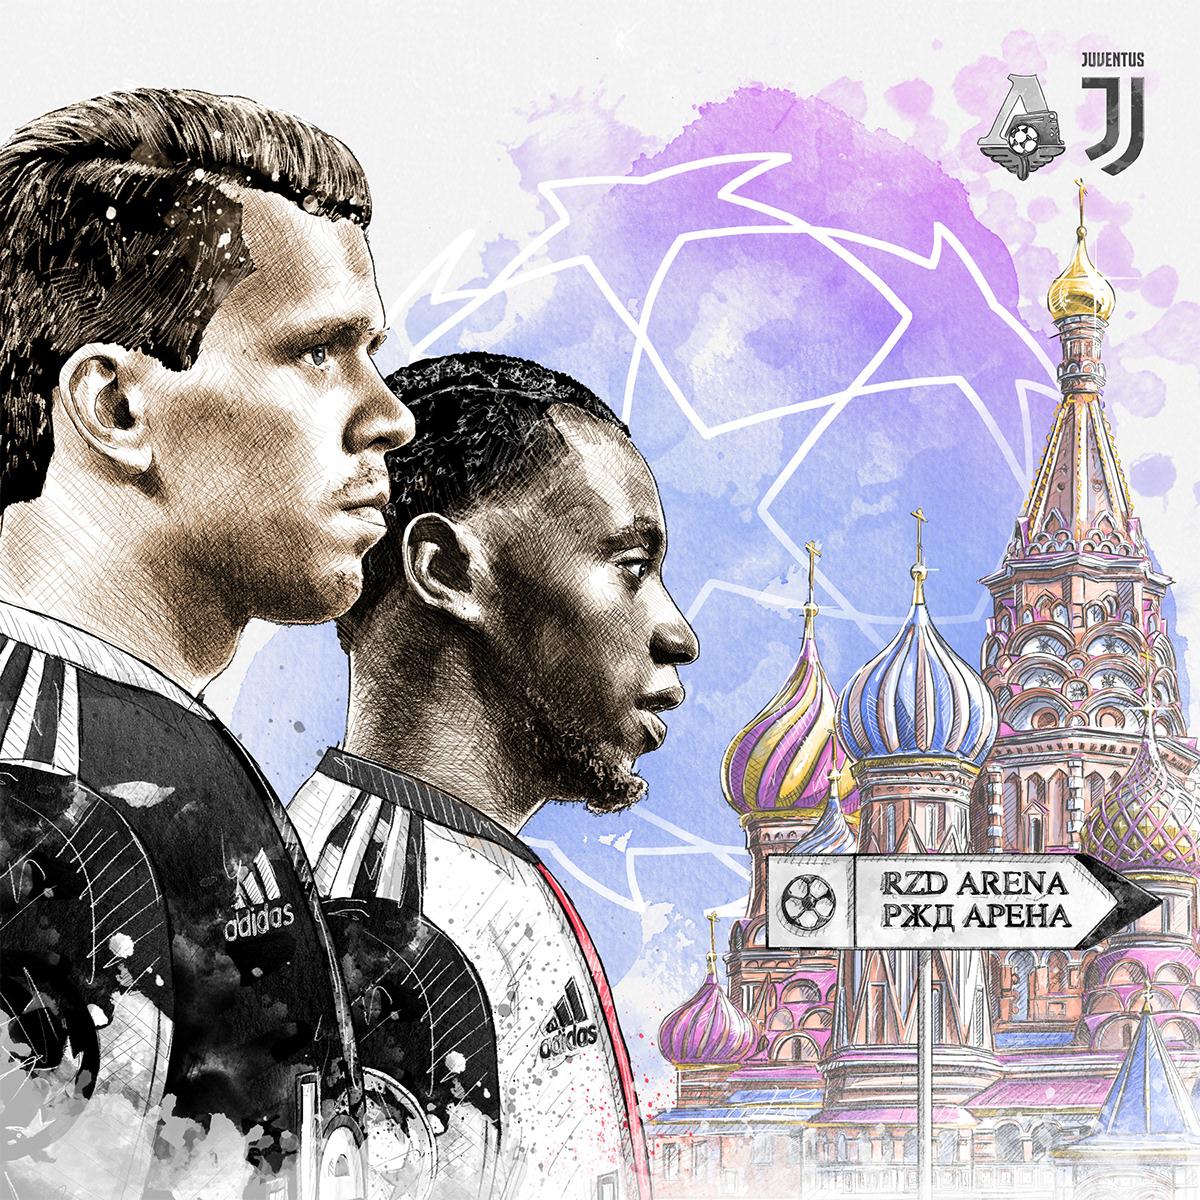 Dynamic sport/football illustration for Juventus vs. Lokomotiv Moscow: Szczesny, Matuidi.